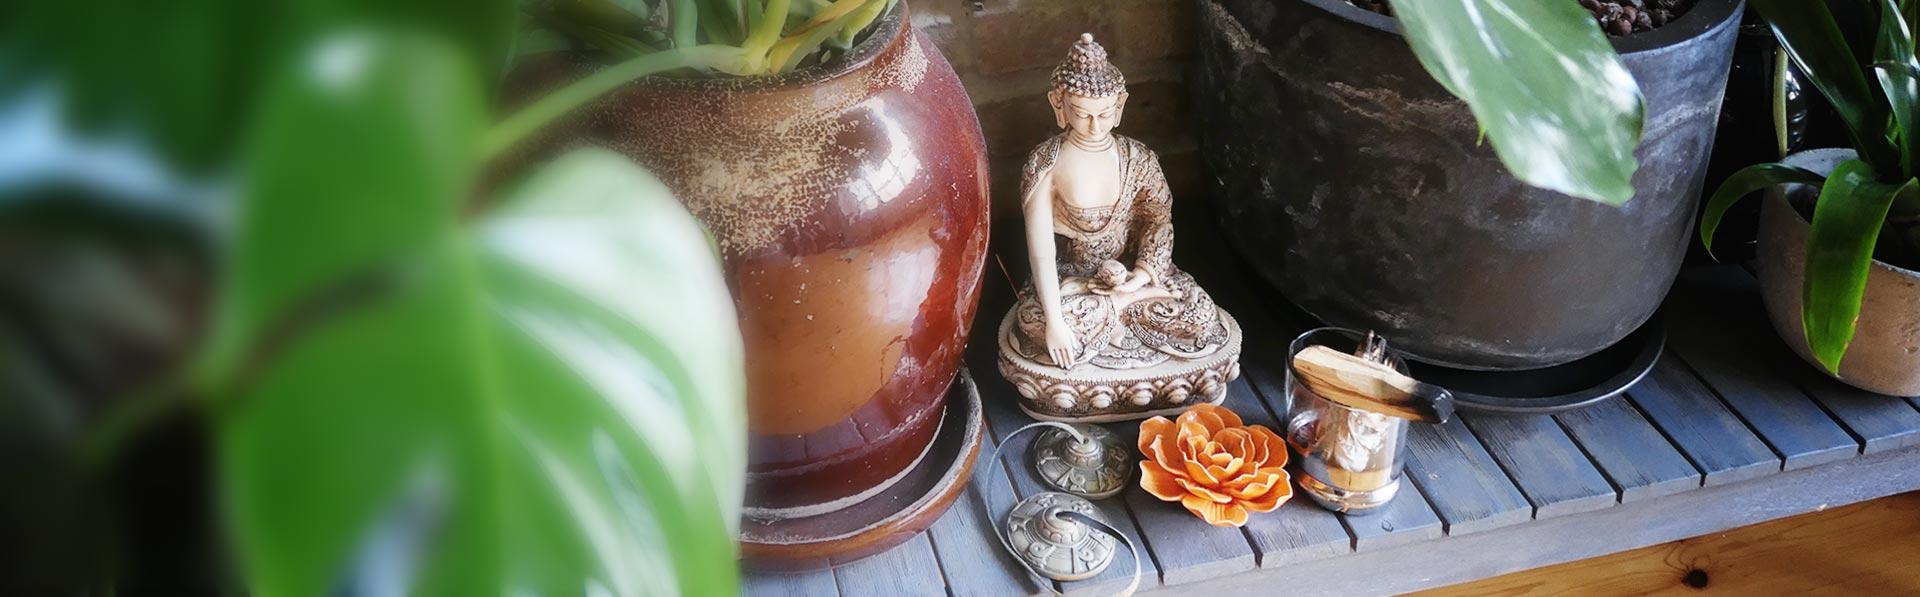 yogafürdich Online-Shop